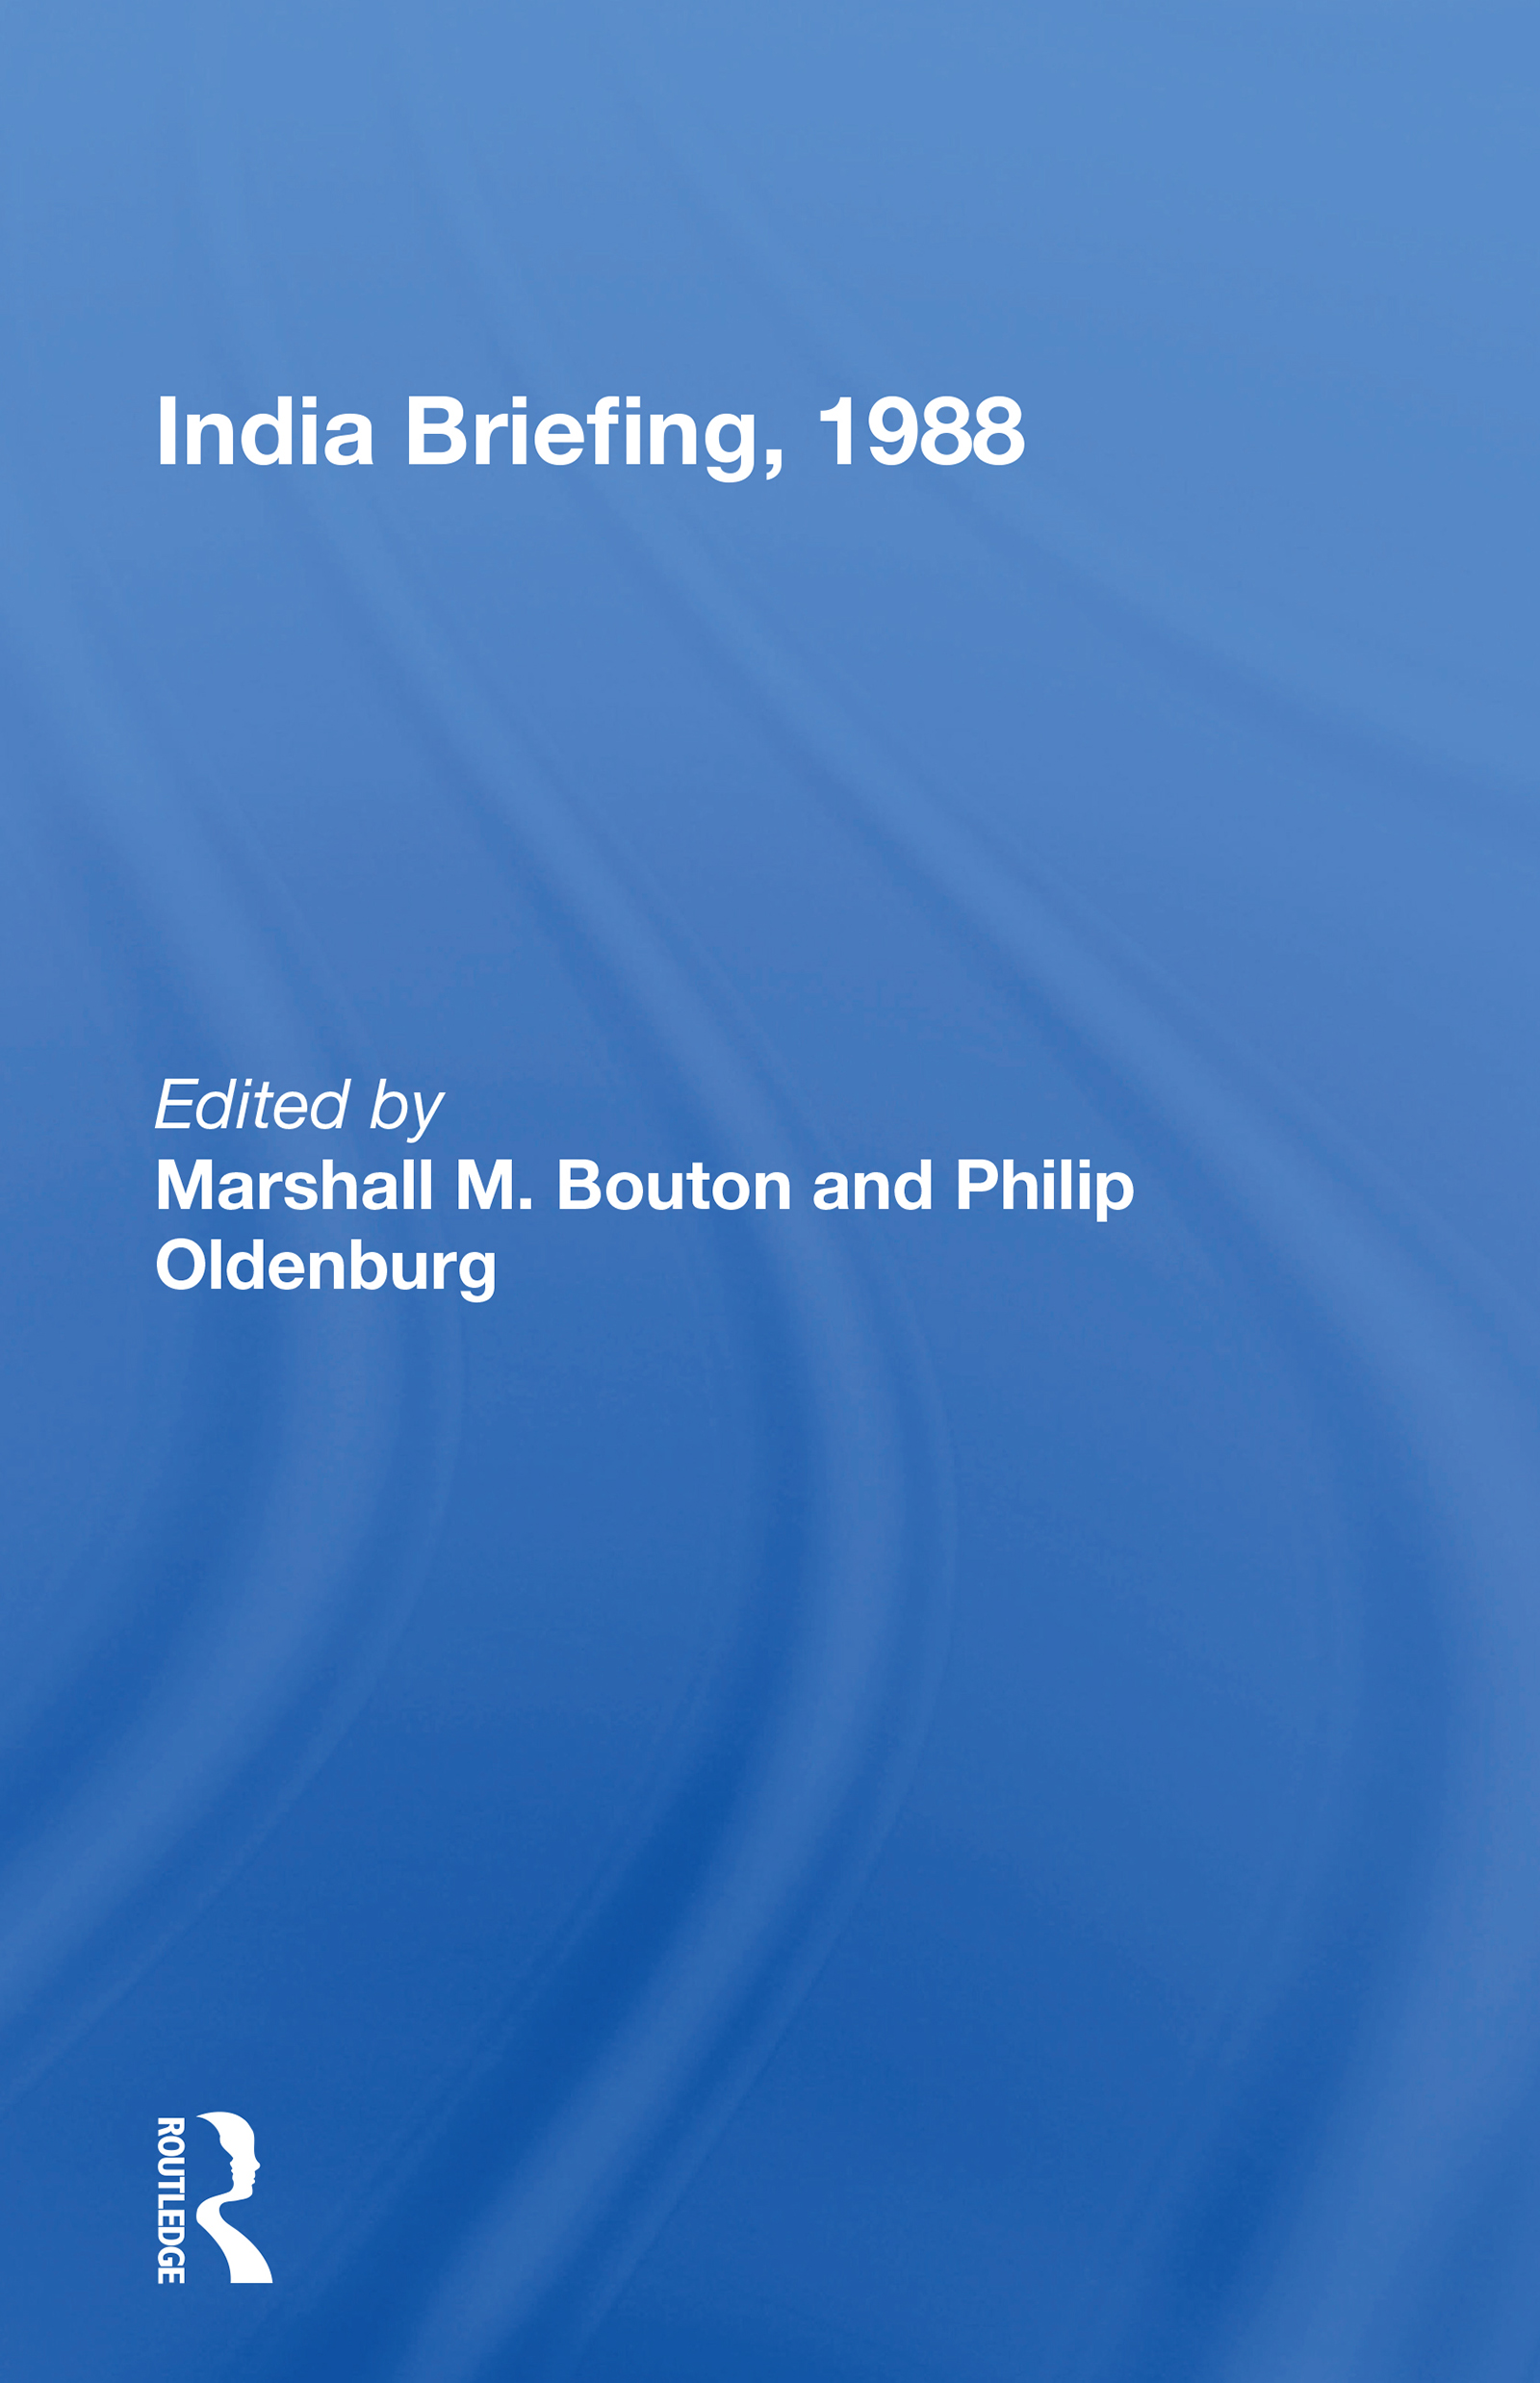 India Briefing, 1988